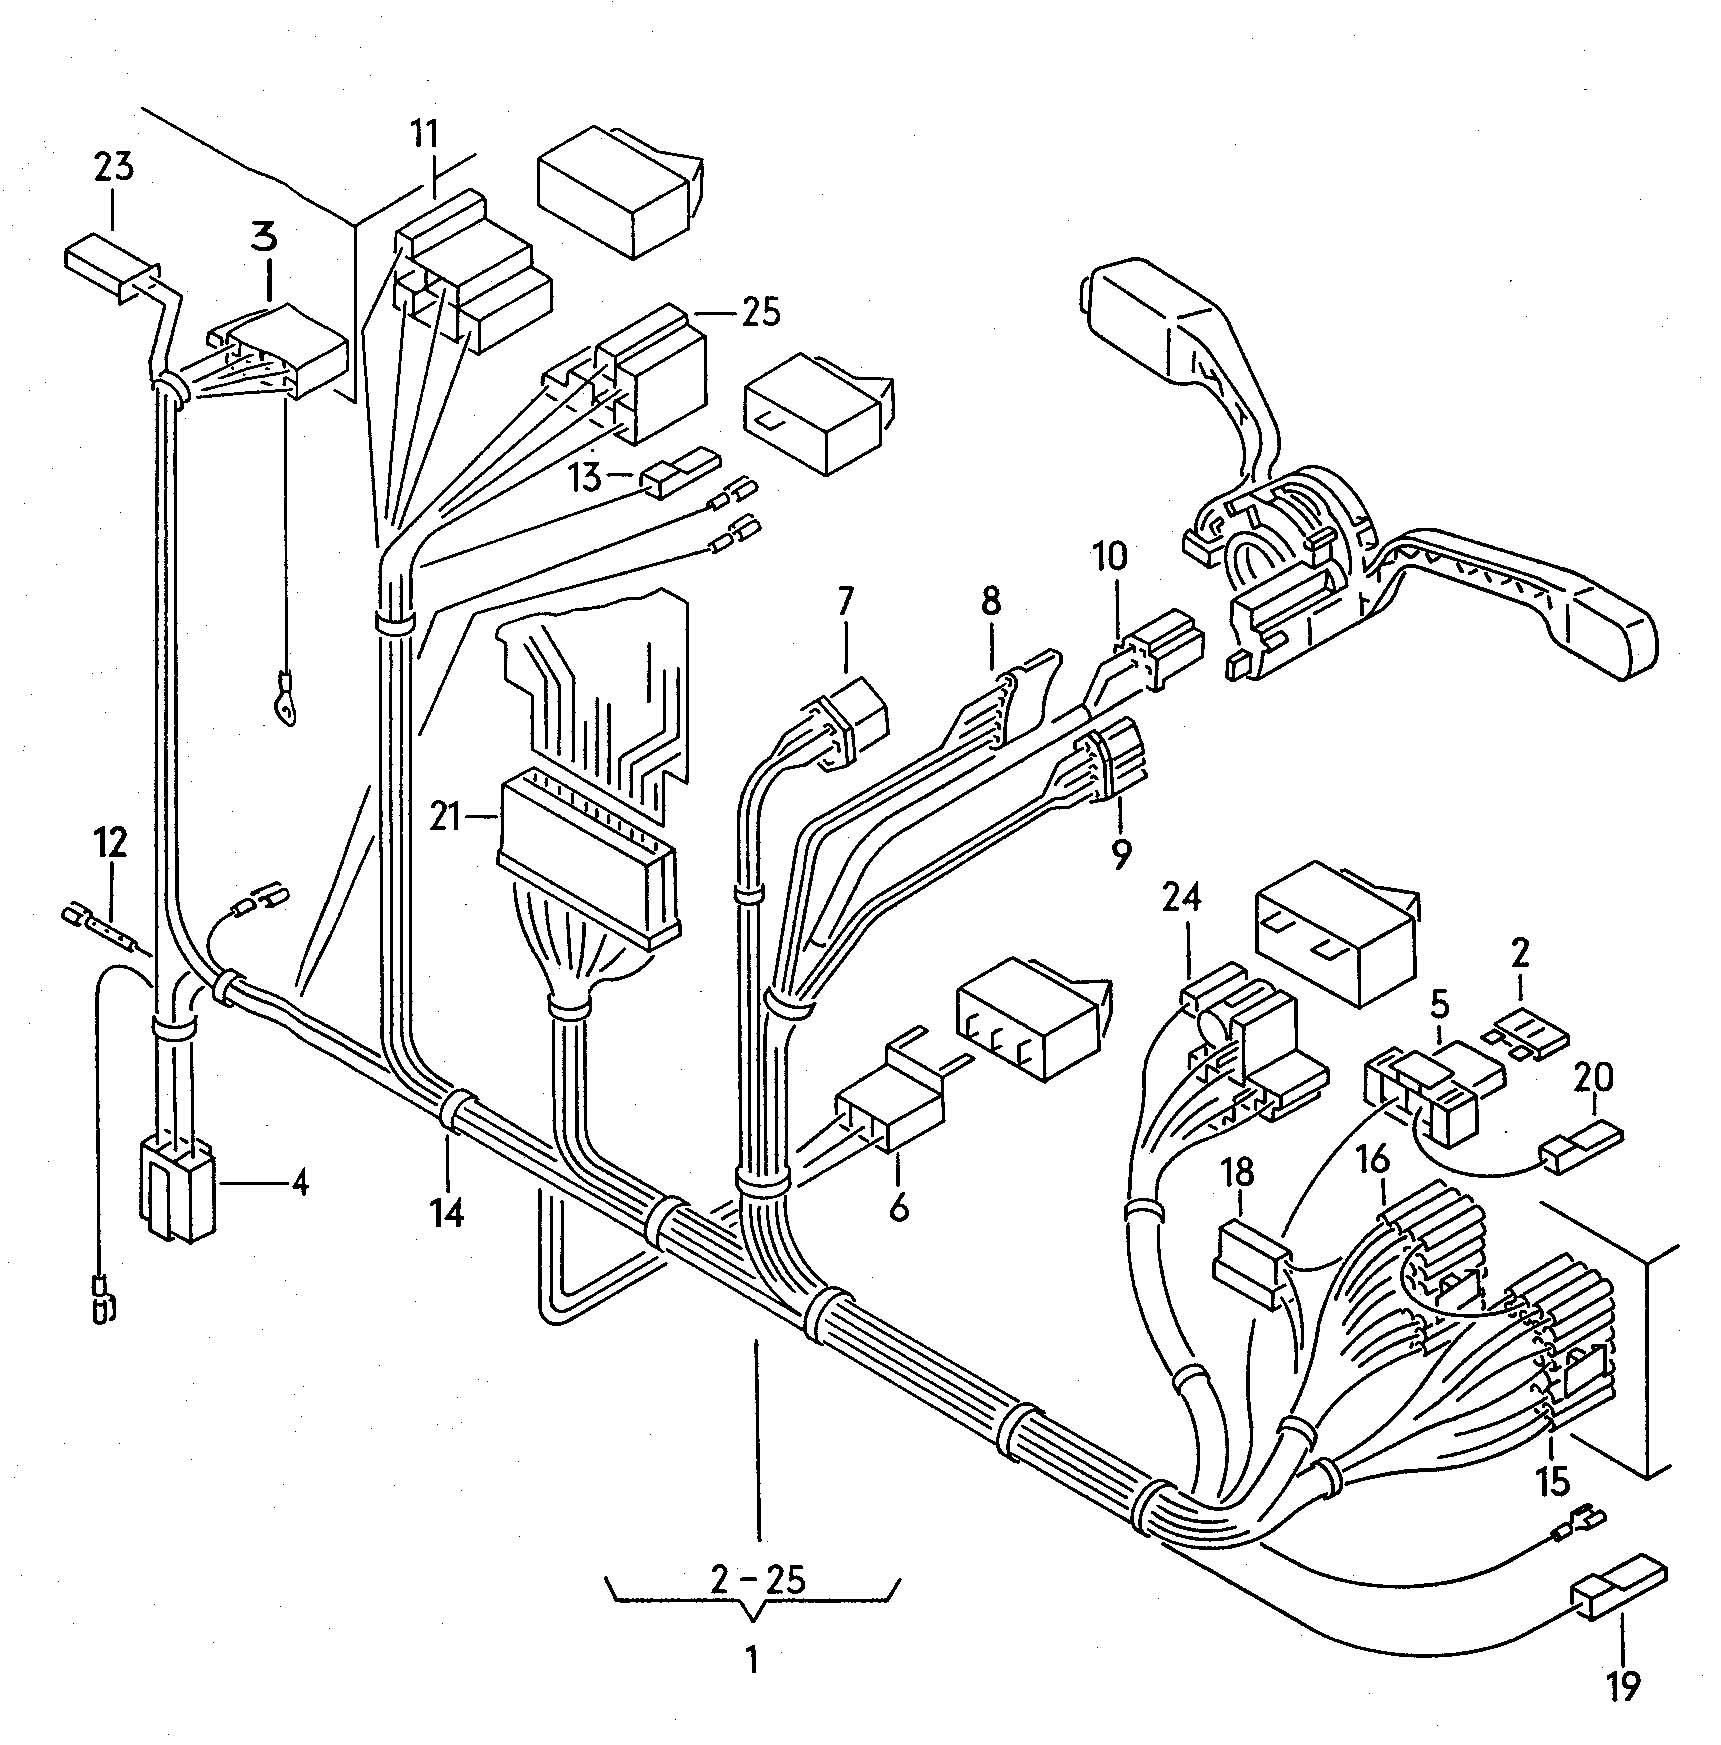 Vw Vanagon Car Radio Engine Diagram And Wiring Volkswagen Eurovan Fuse Box Showassembly On